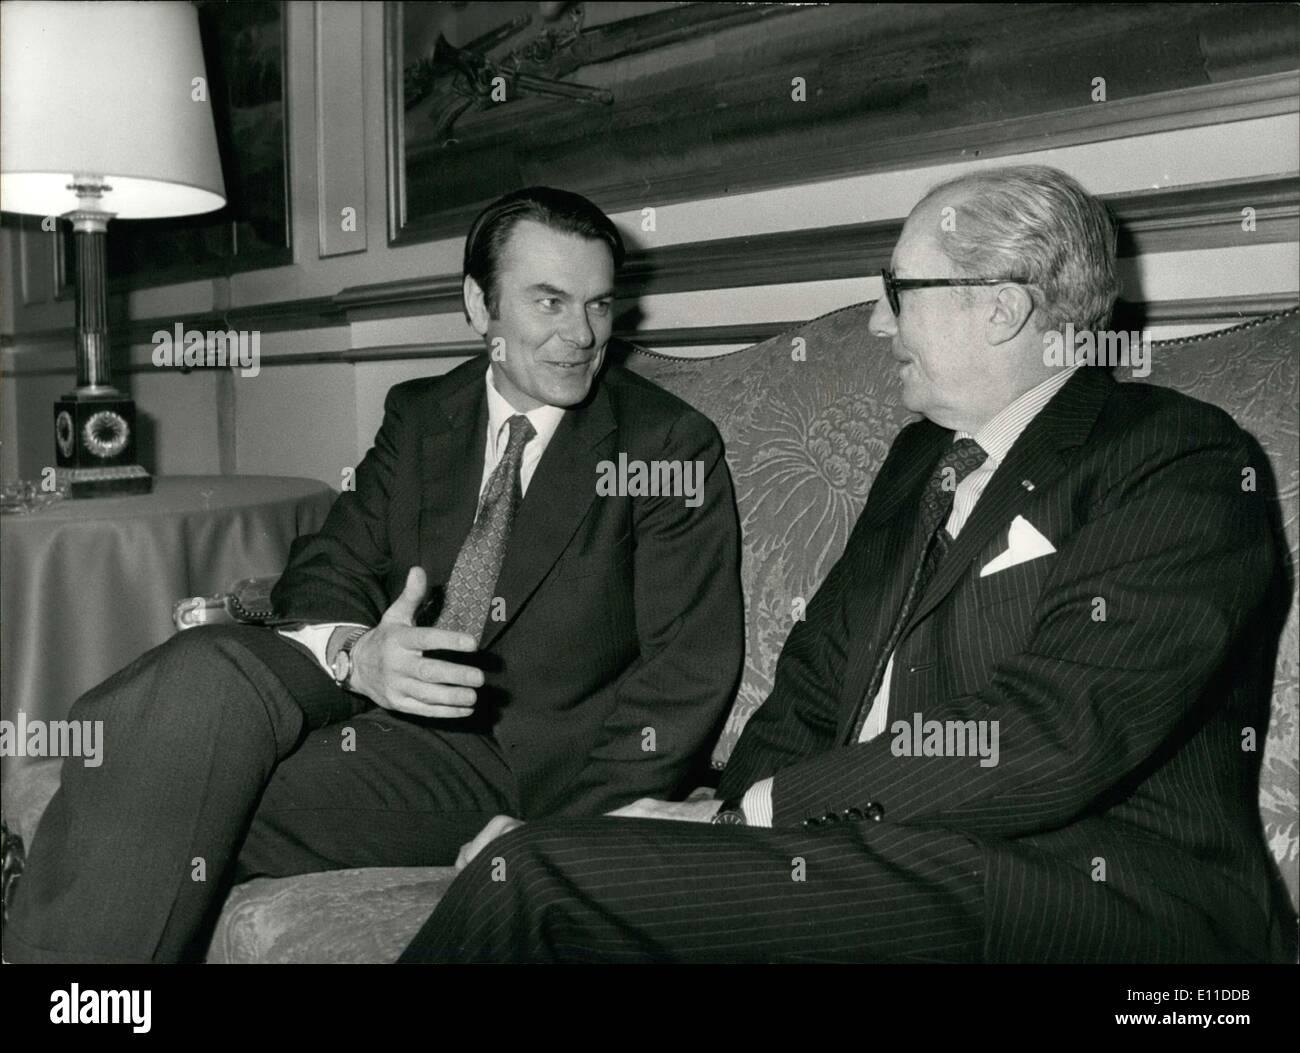 Feb. 26, 1977 - David Owen (Britian) & Louis de Guiringaud Meet Quai d'Orsay APRESS.co - Stock Image